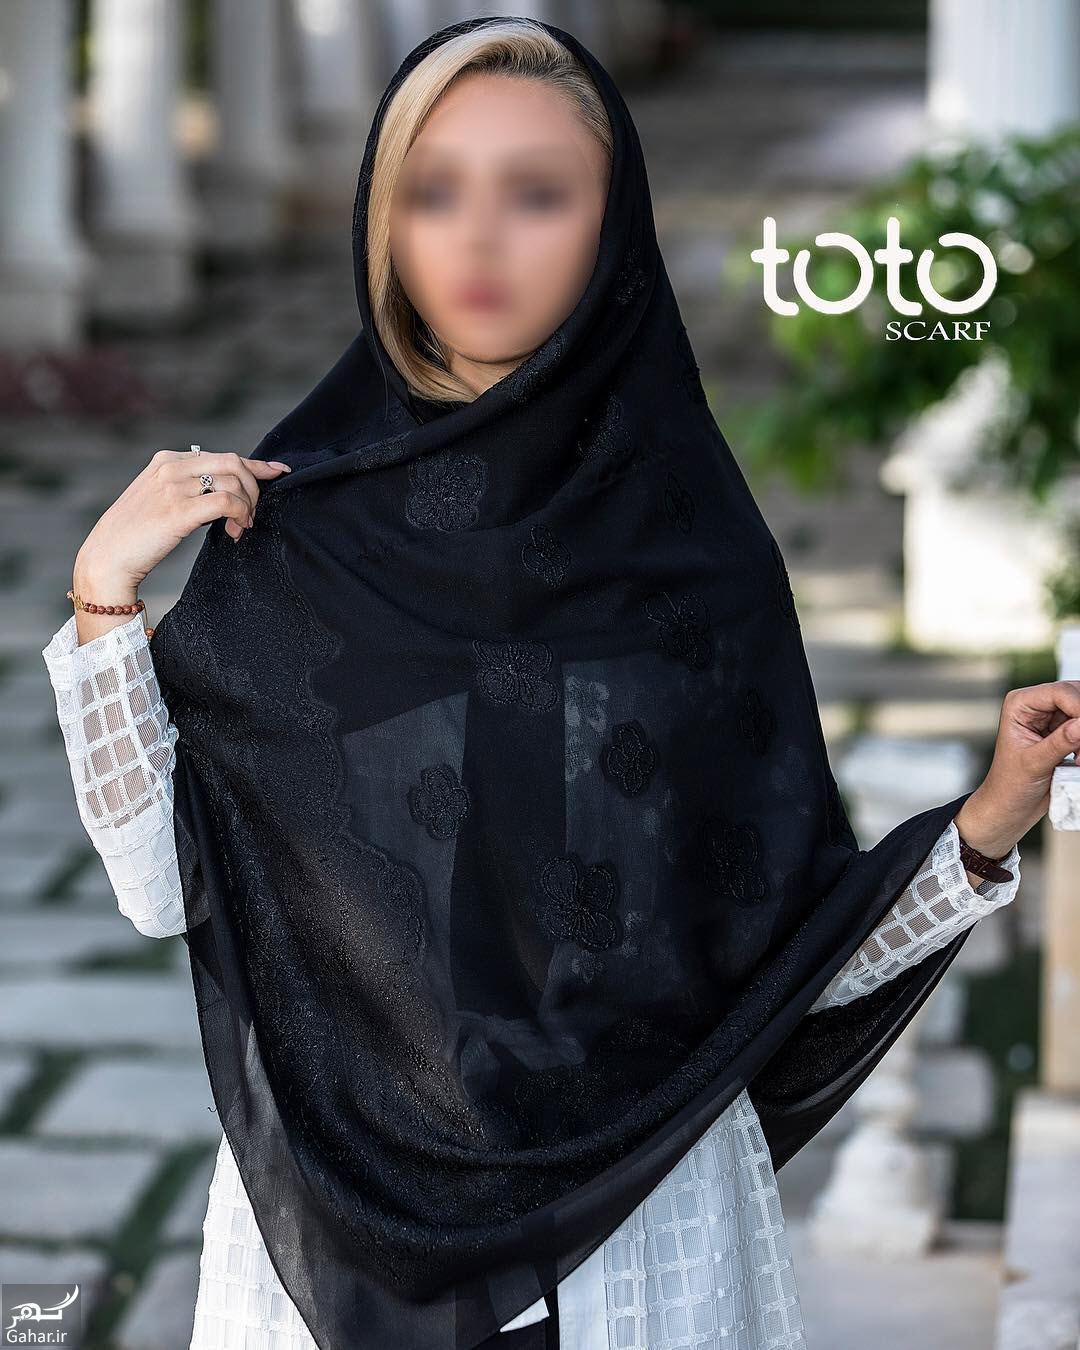 937844 Gahar ir جدیدترین مدل های شال و روسری از برند ایرانی توتو